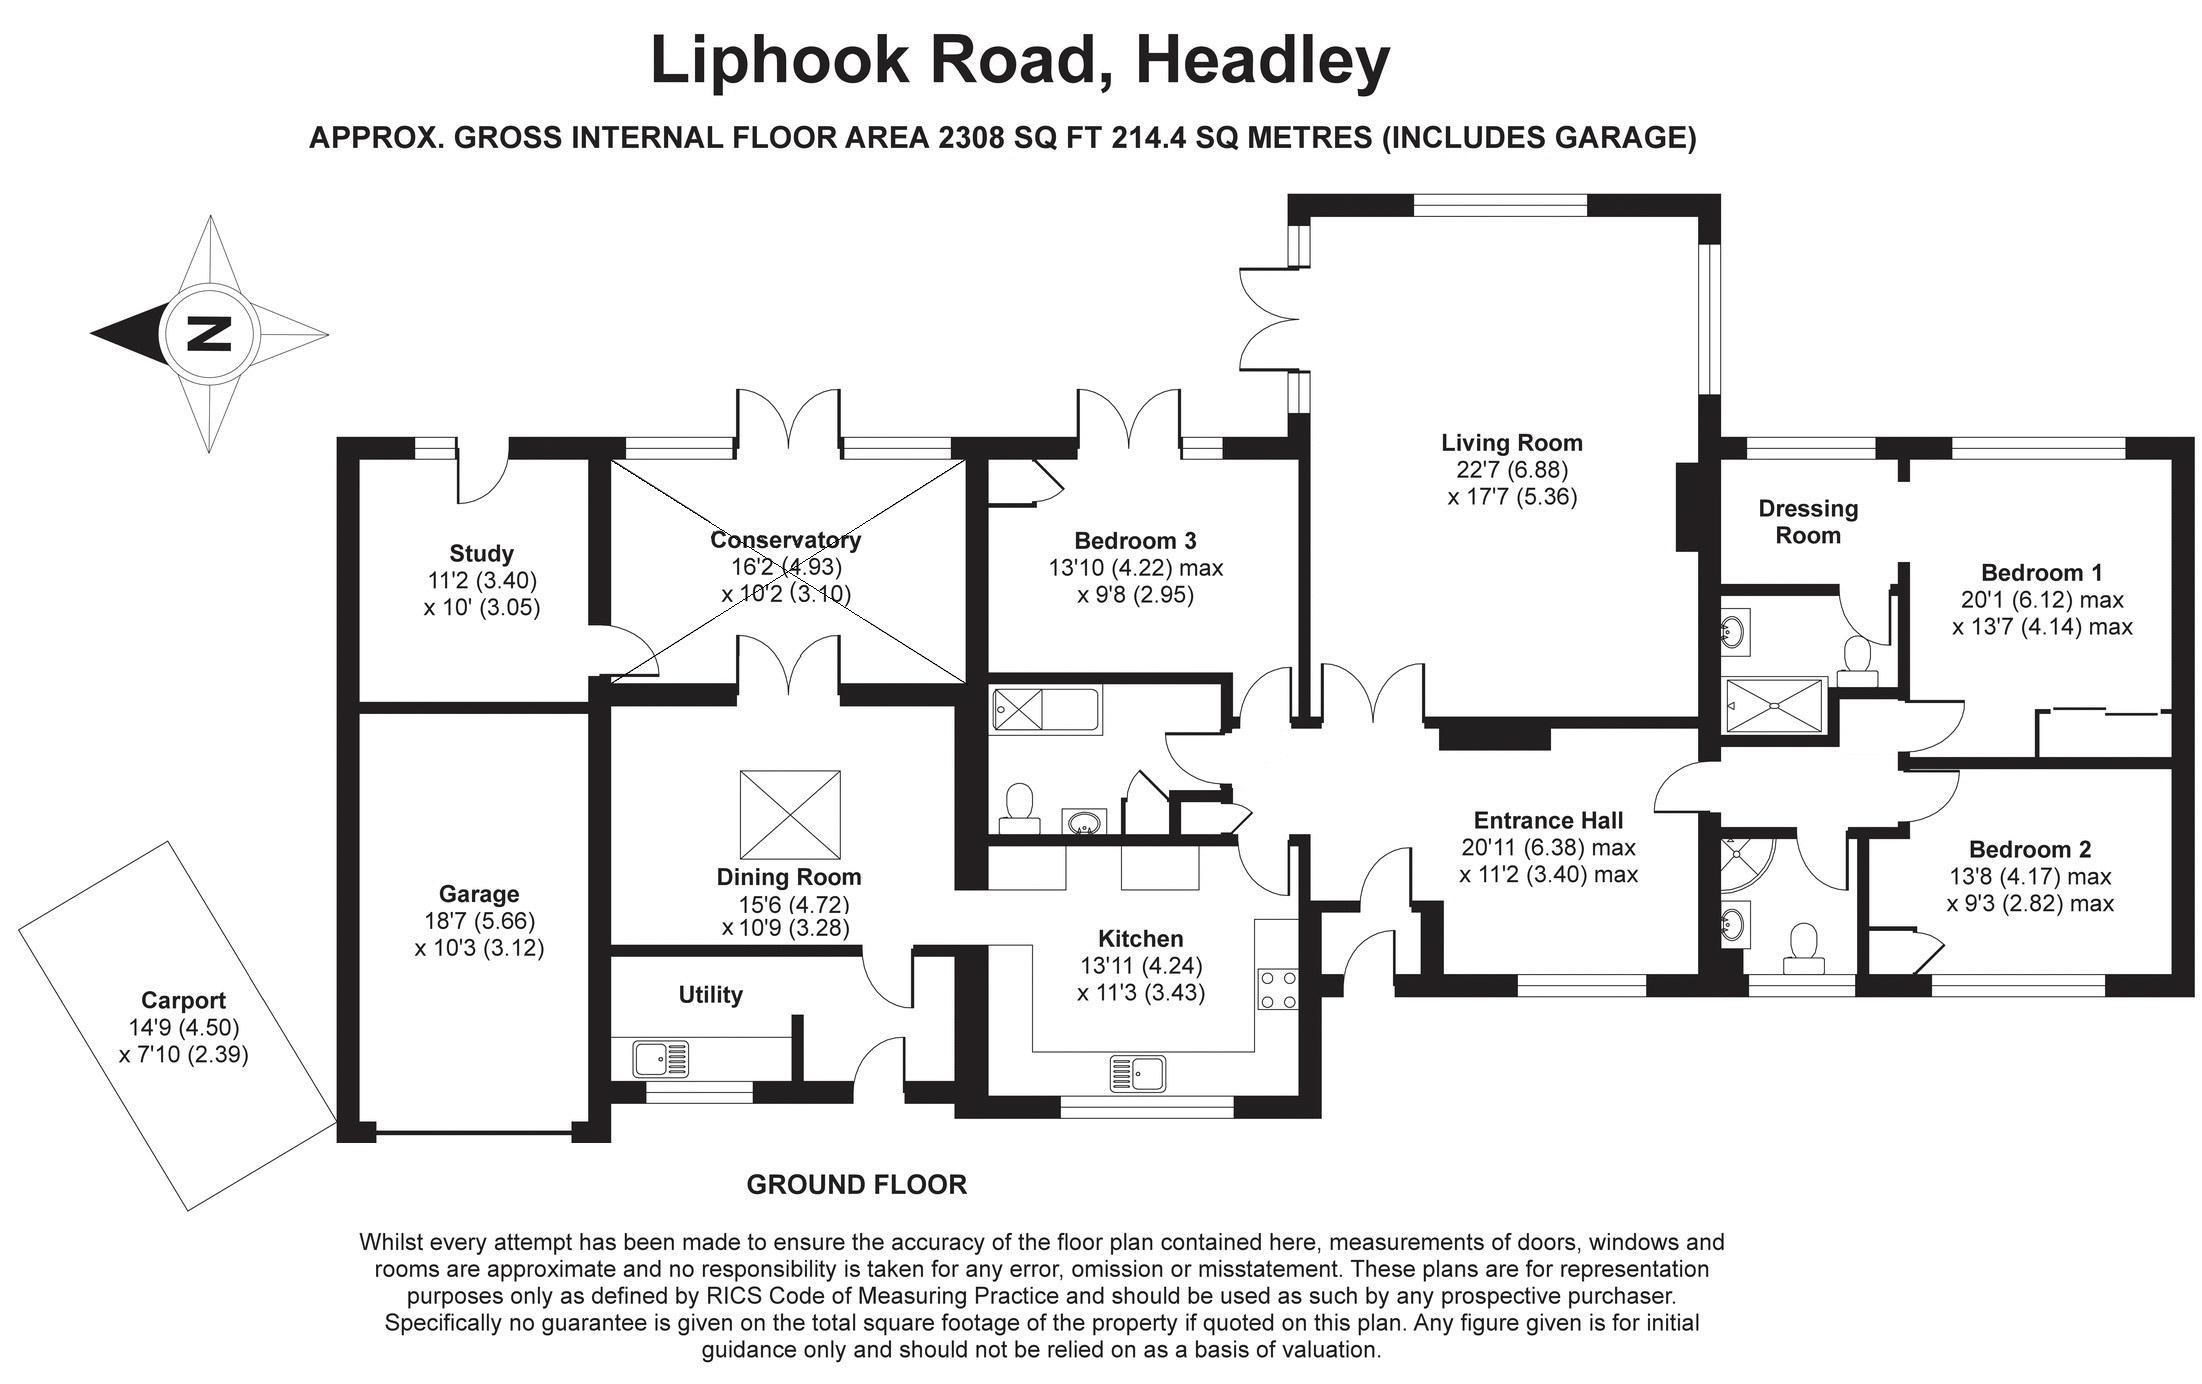 Liphook Road Headley